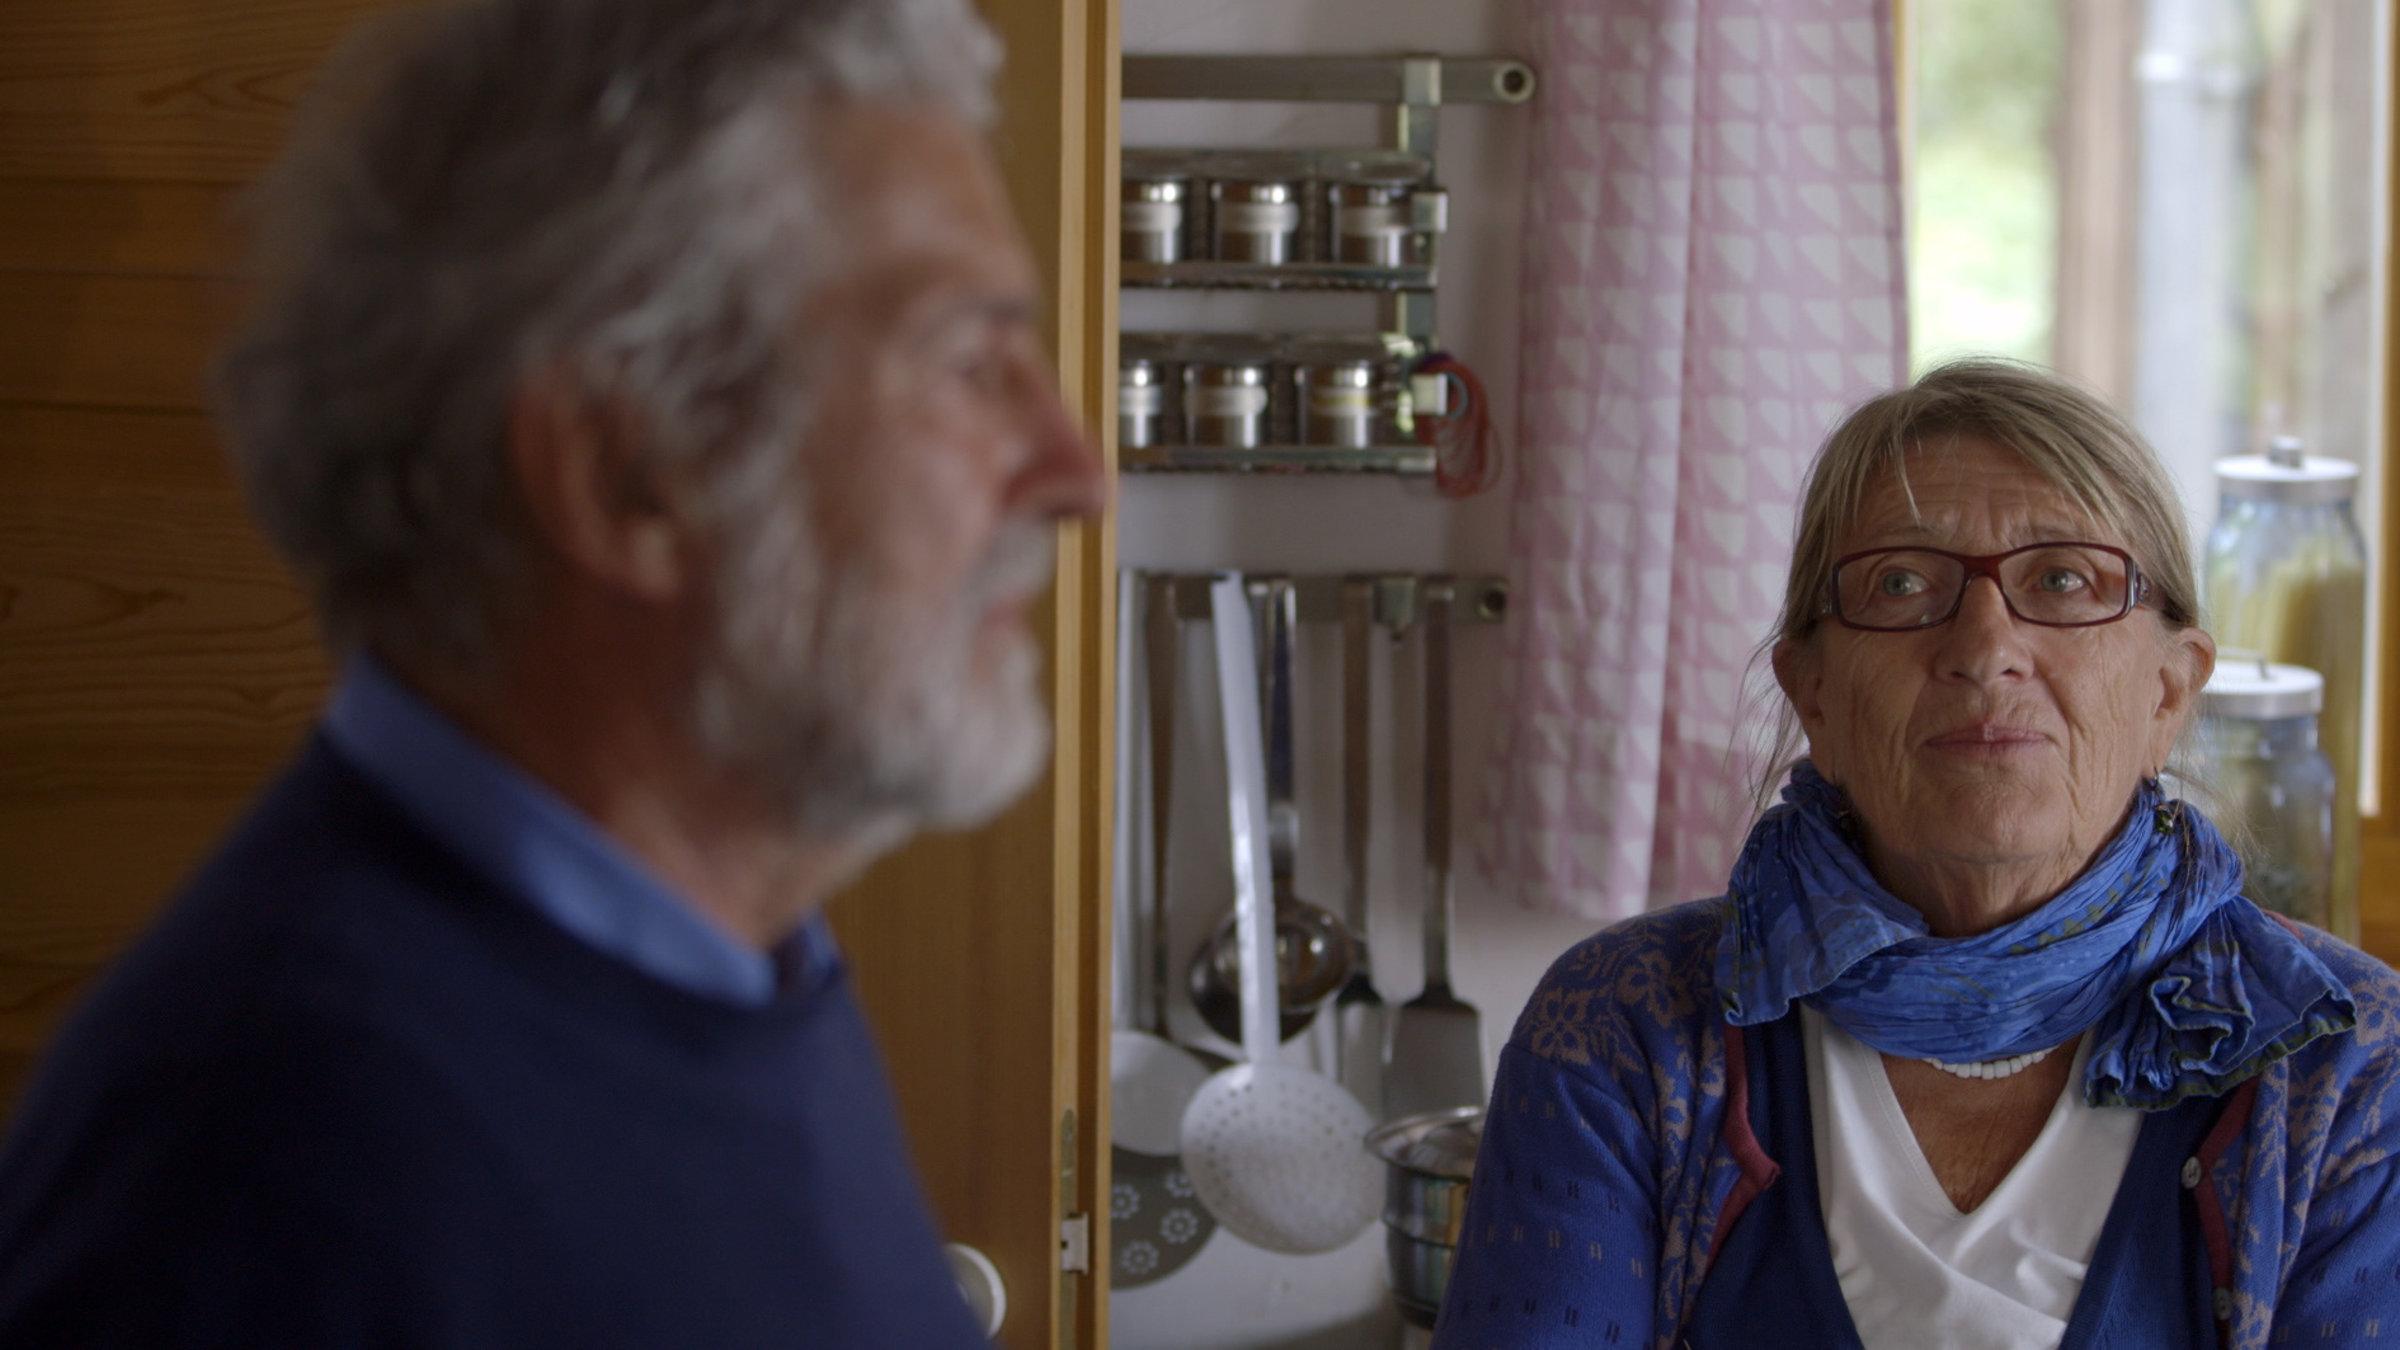 Film Küche | House Of Love Kuche Zdfmediathek